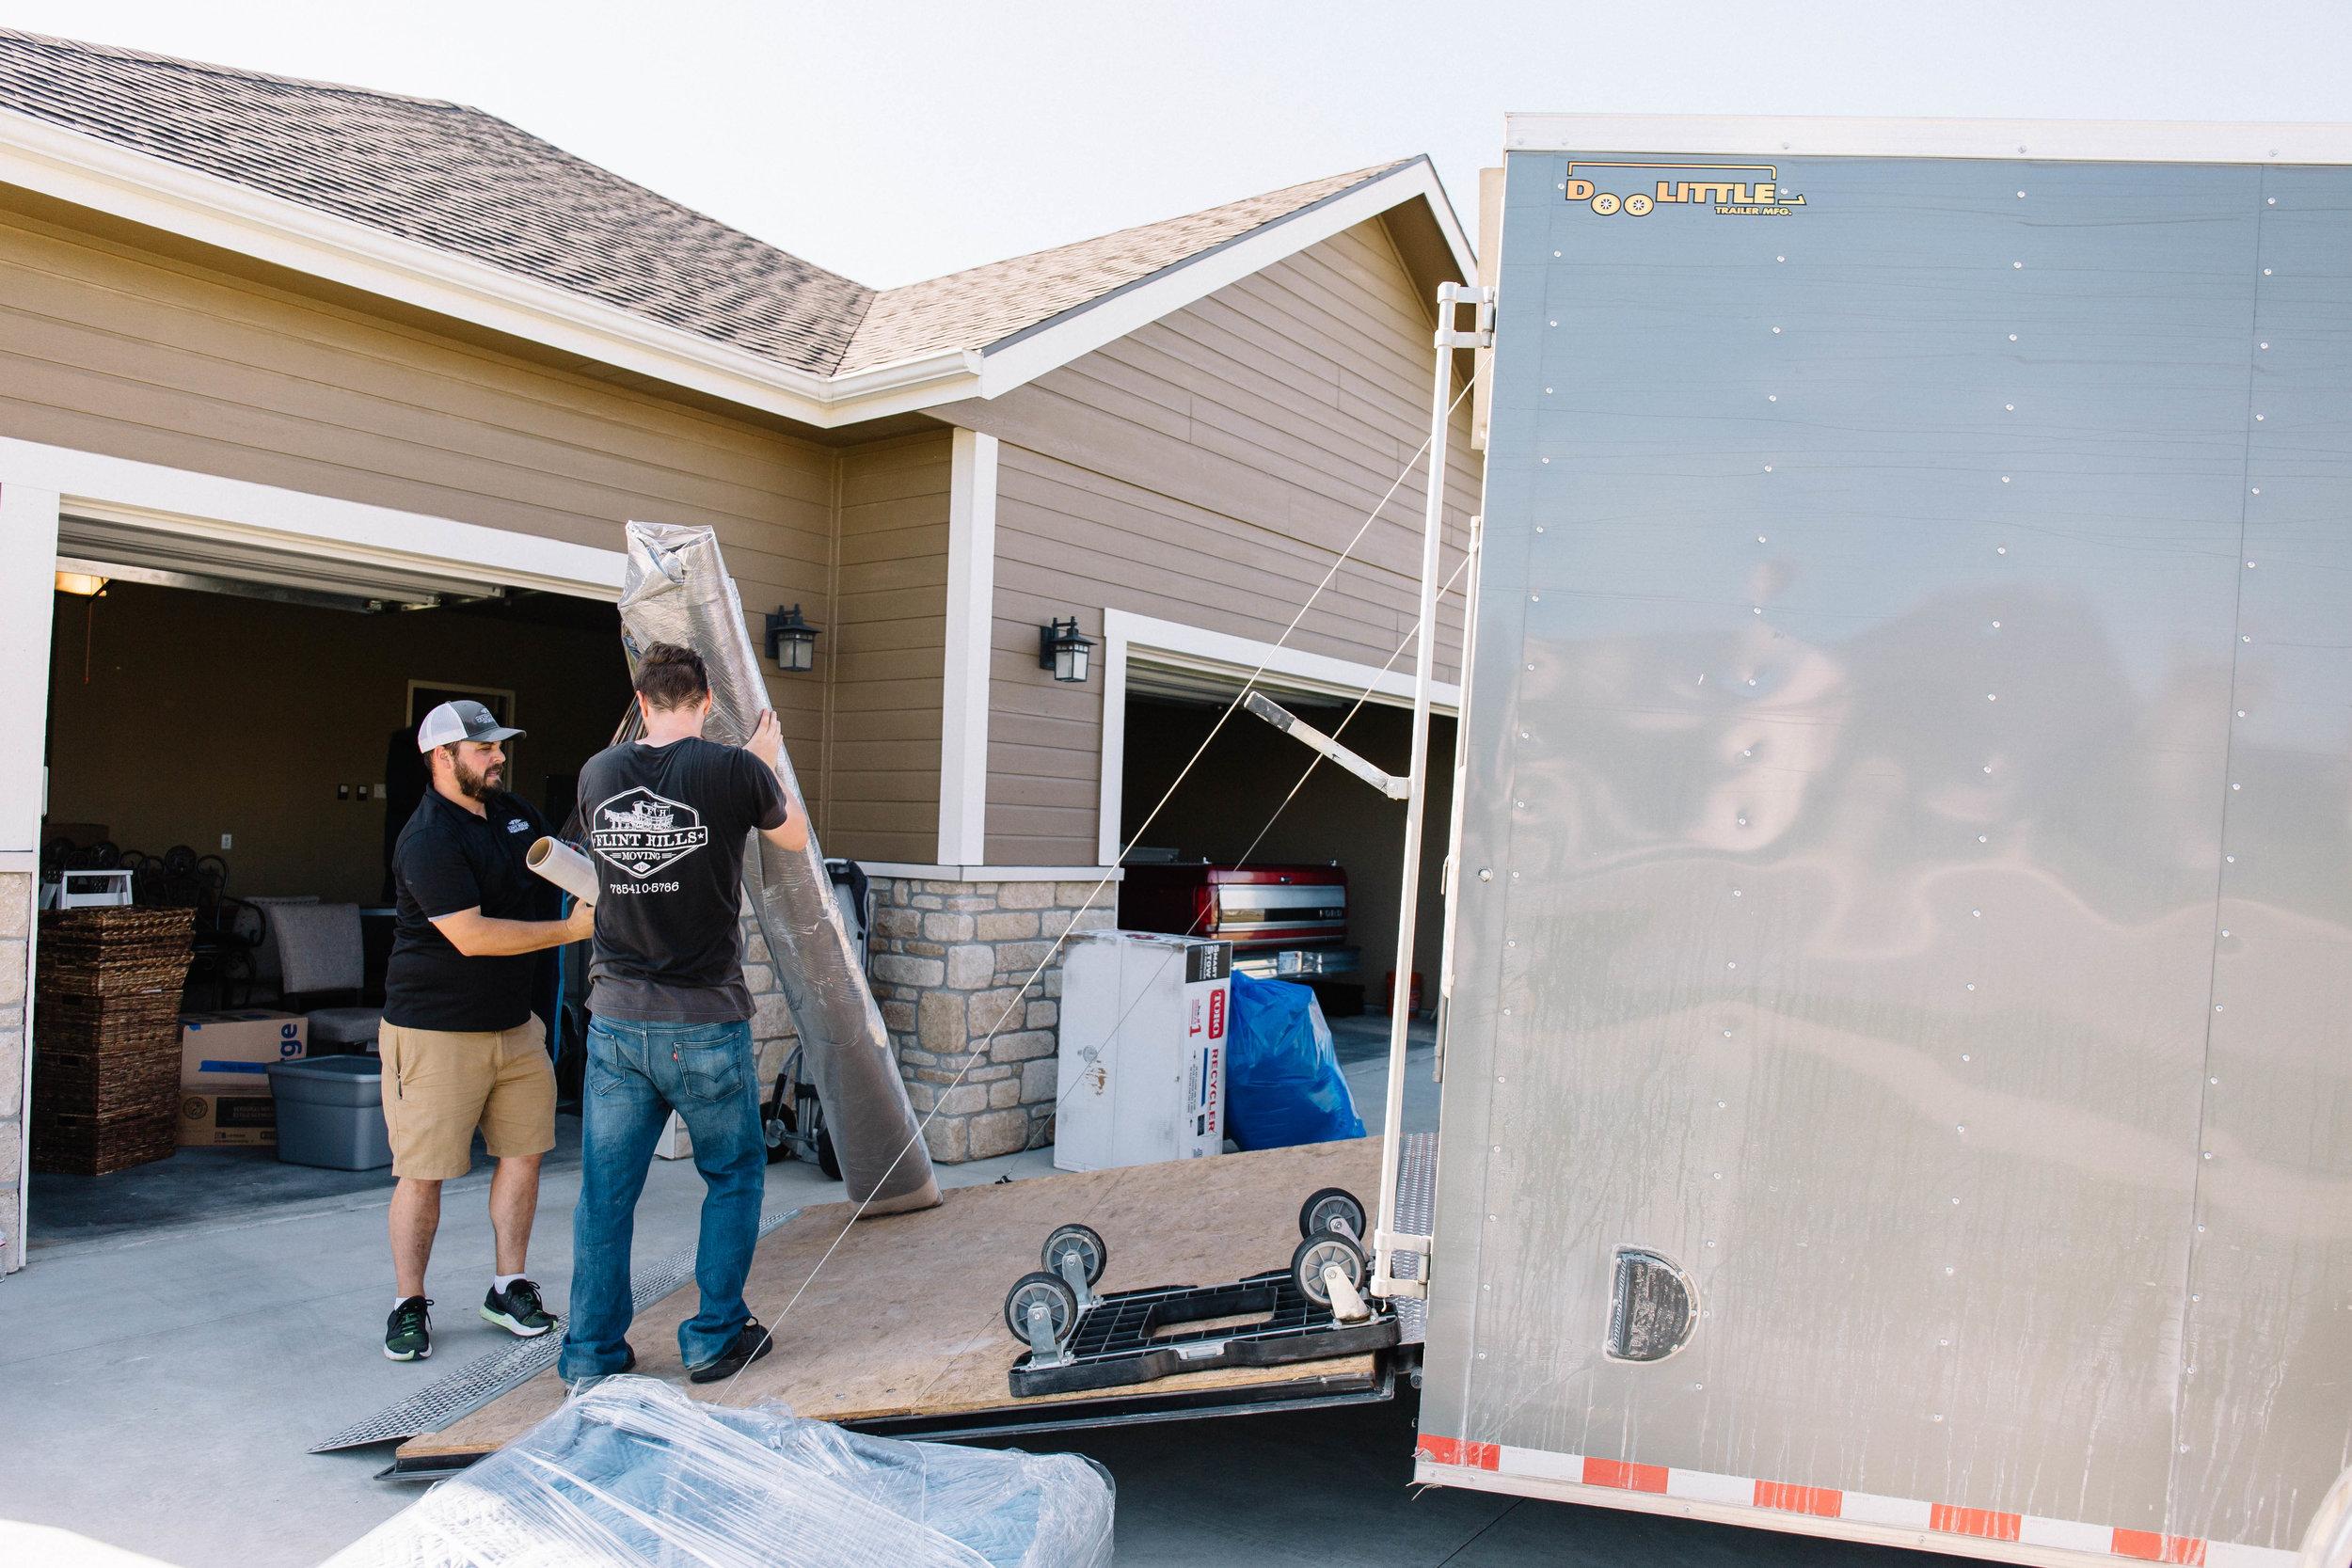 Flint Hills Moving Manhattan Kansas Moving Truck Moving Company Best Moving Company Uhaul Budget